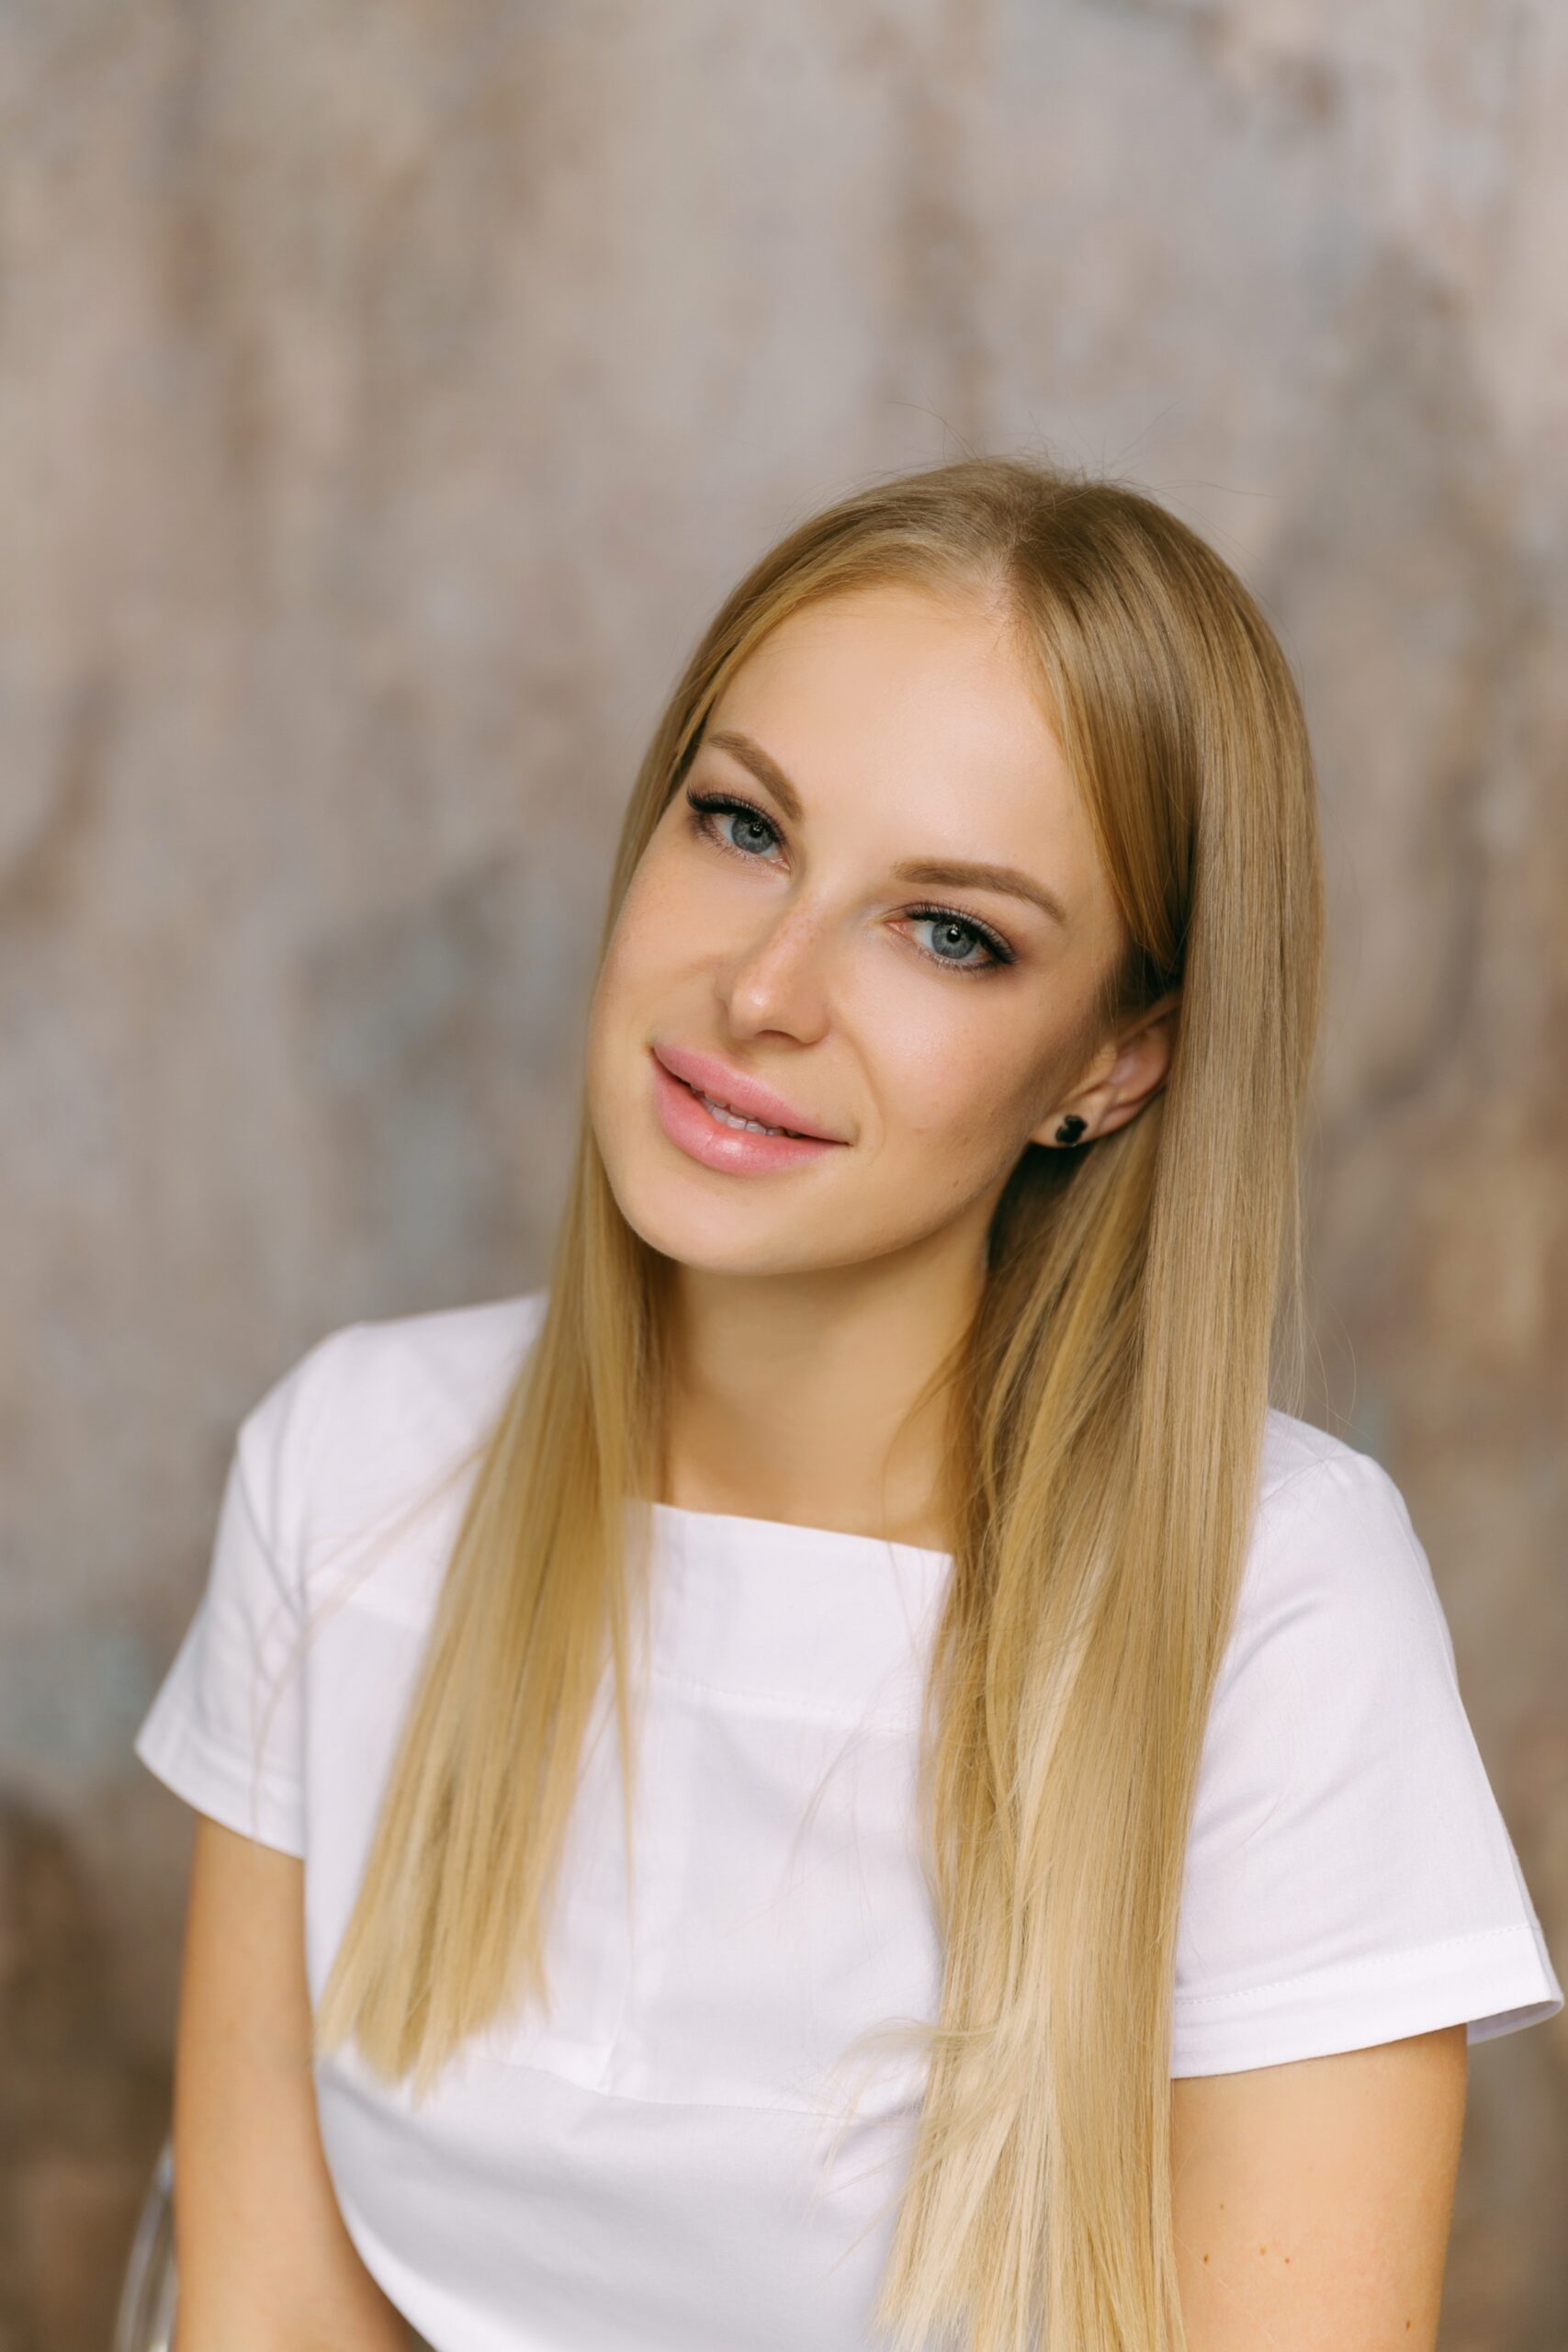 Селивоненко Маргарита Витальевна